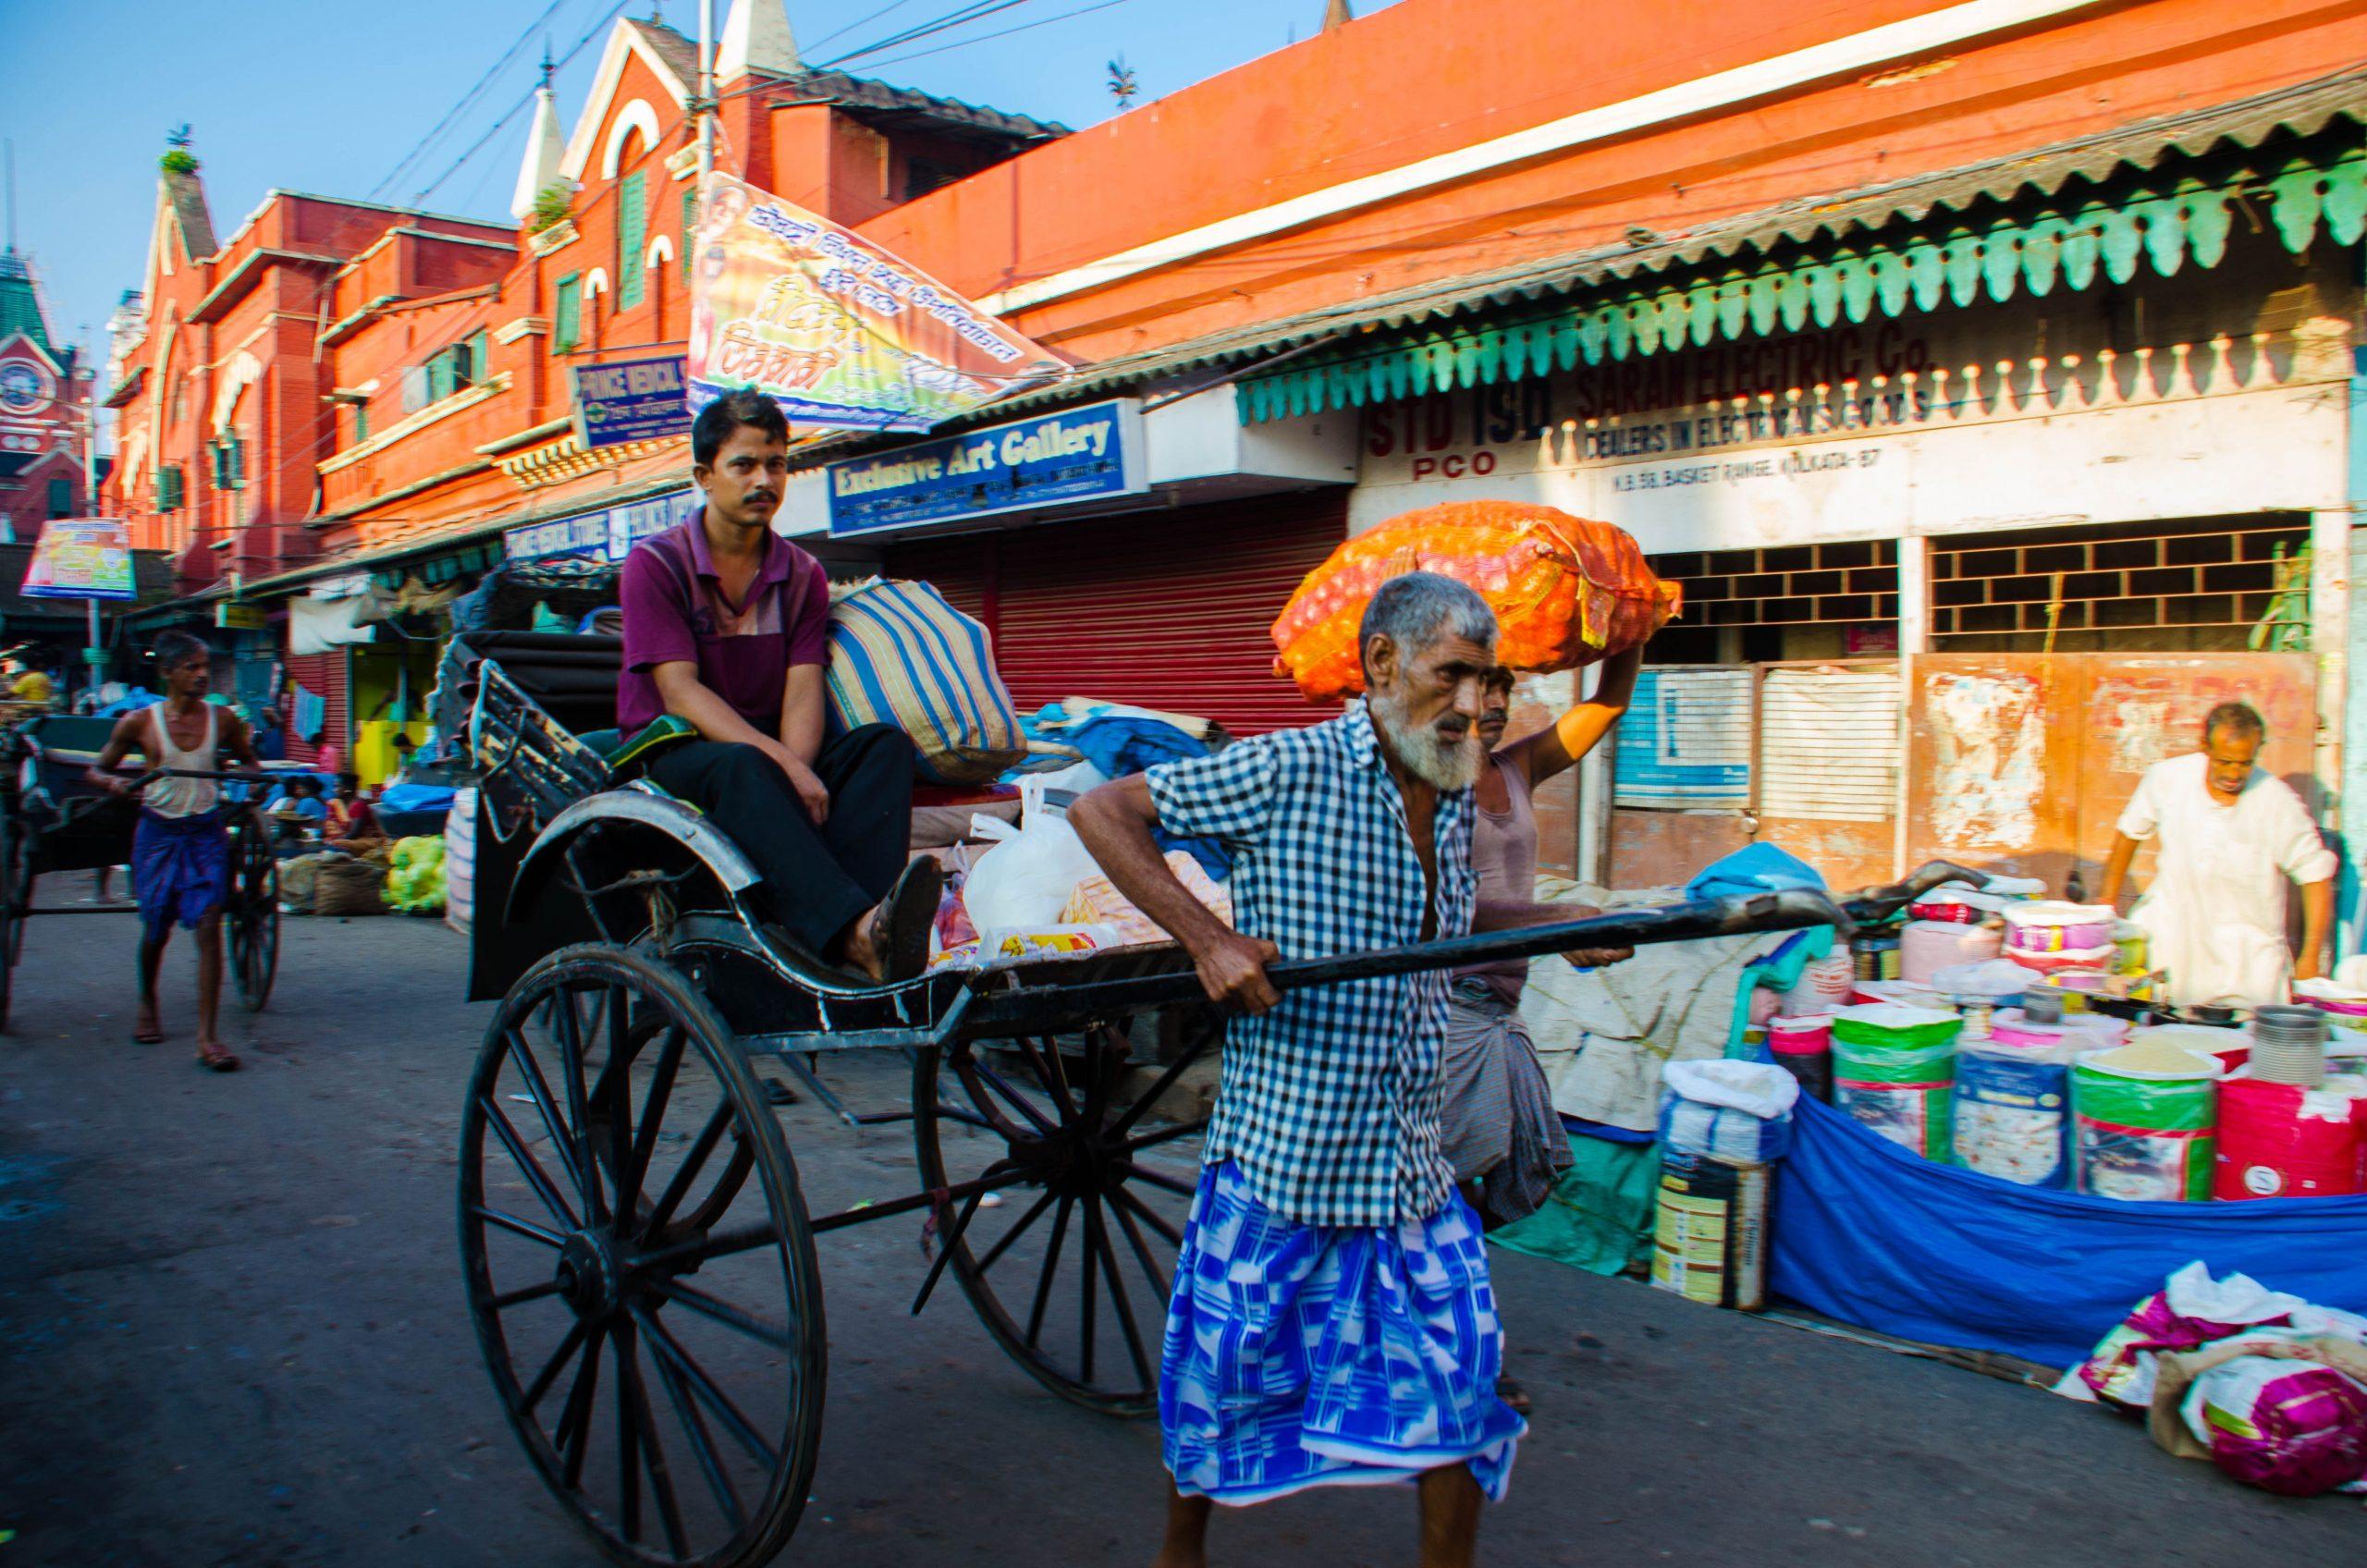 A pulled rickshaw in a market